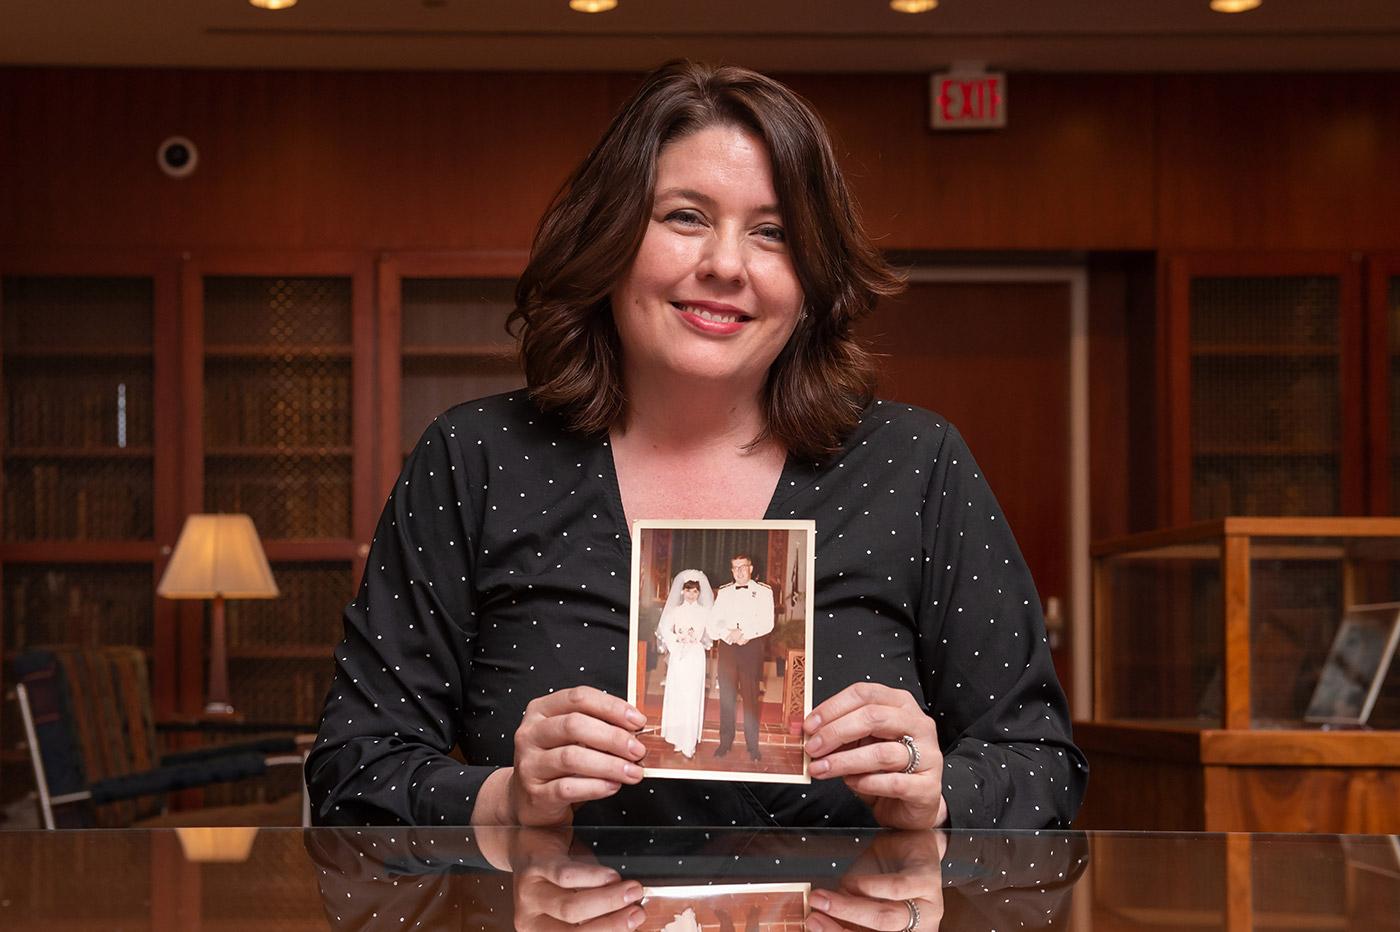 Author Kim O'Connell